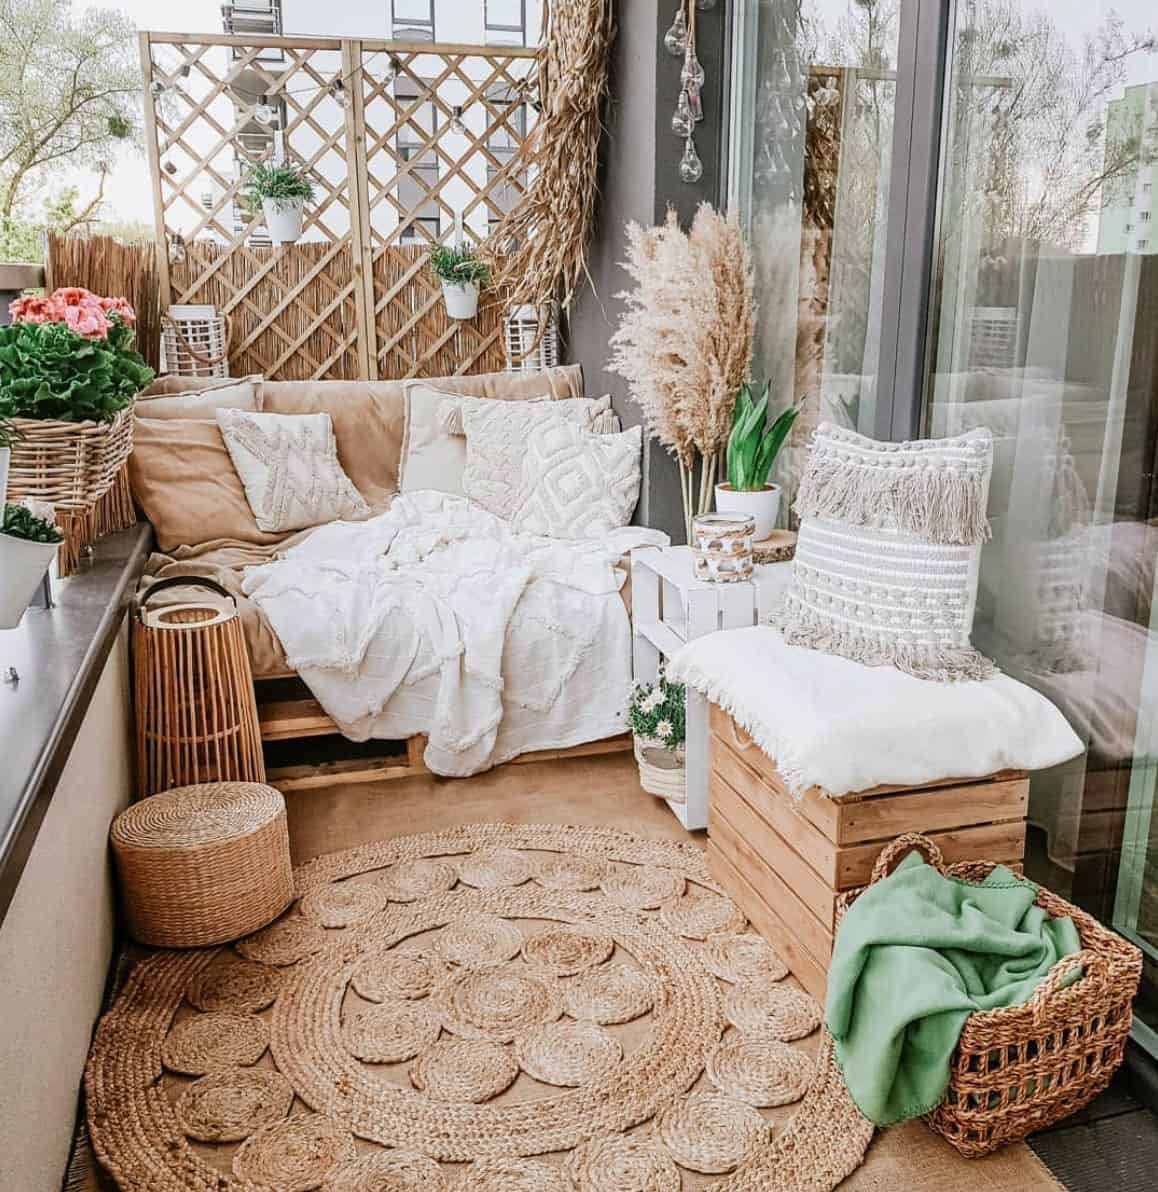 apartment-balcony-idea-with-cozy-seating